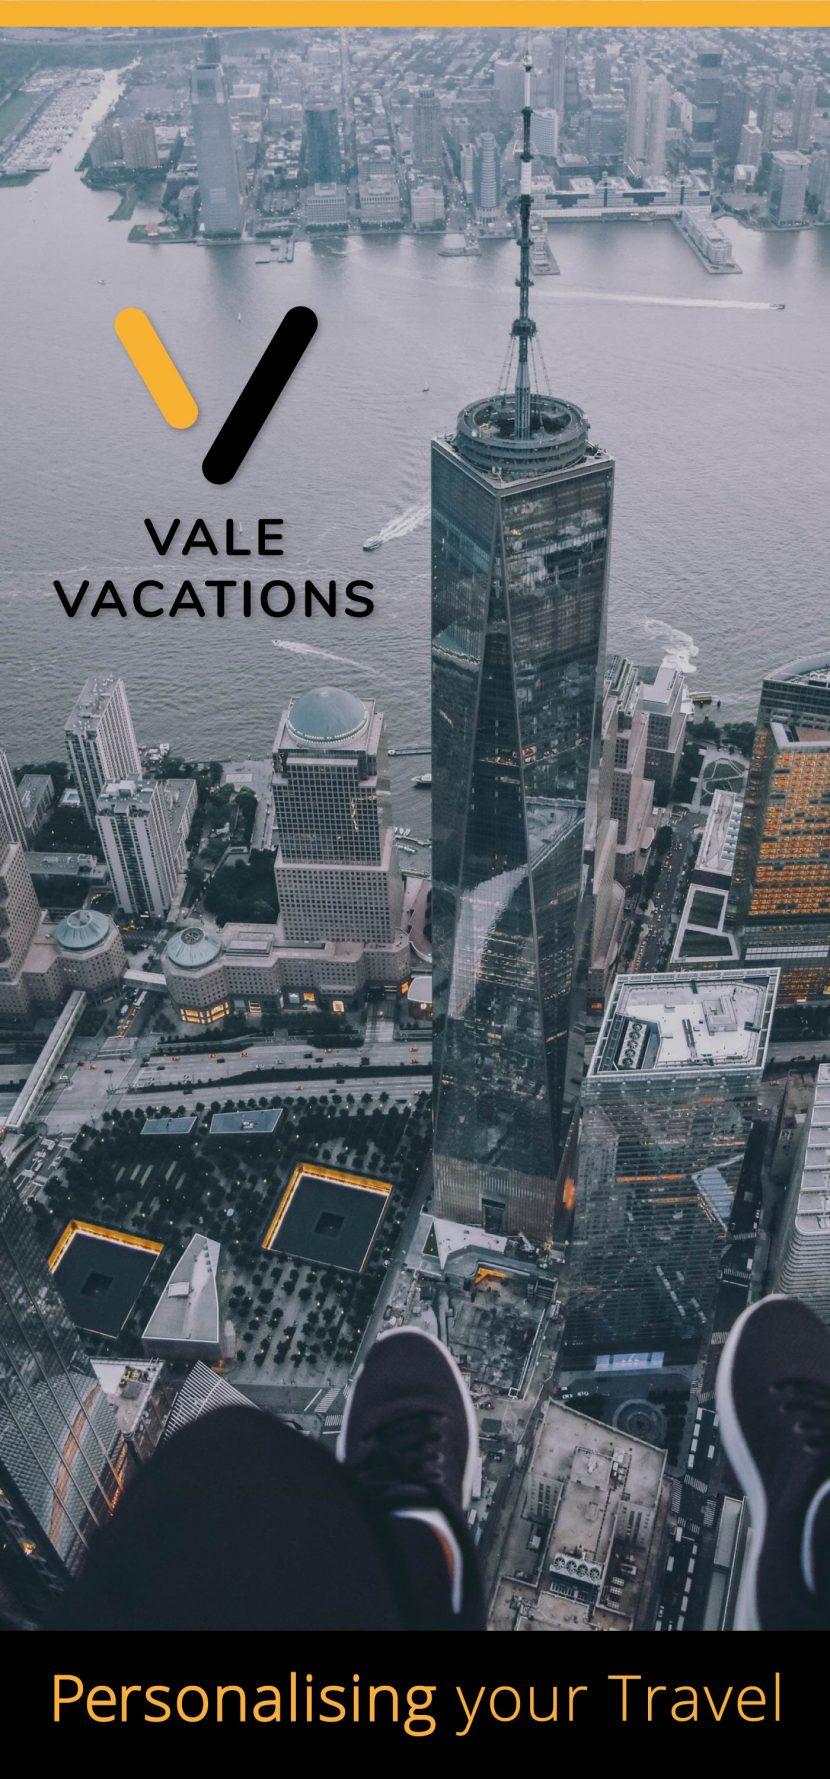 SugarLab Creative SA - Logo Design for Vale Vacations